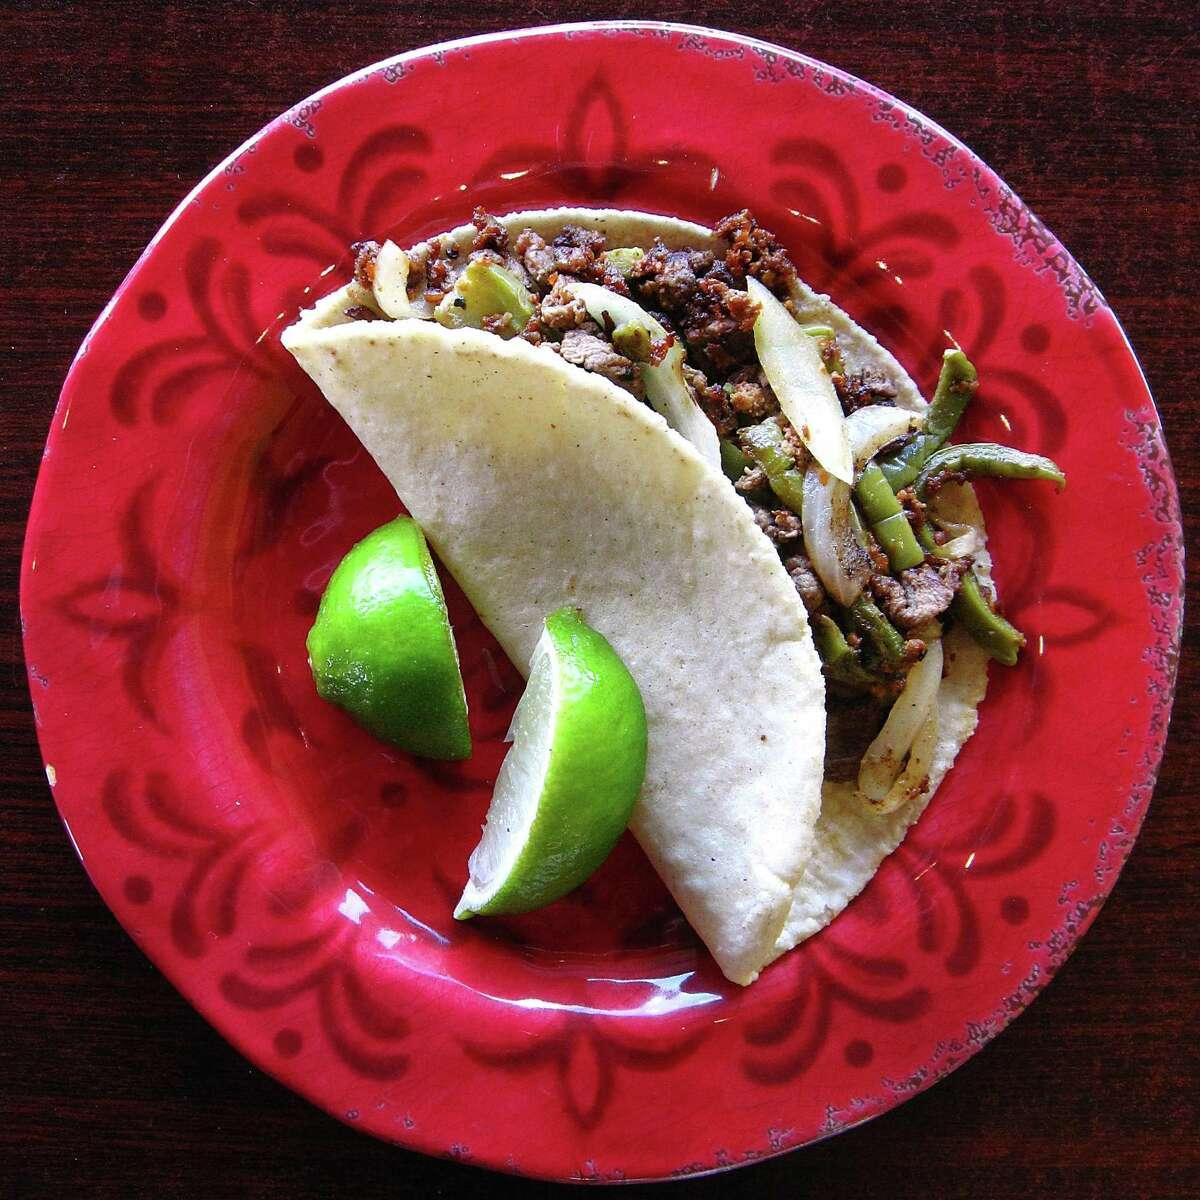 Taco of the Week: Taco Estilo GTO with beef, chorizo, grilled onions and nopales on a handmade corn tortilla from Las Sabrosas de Guanajuato.